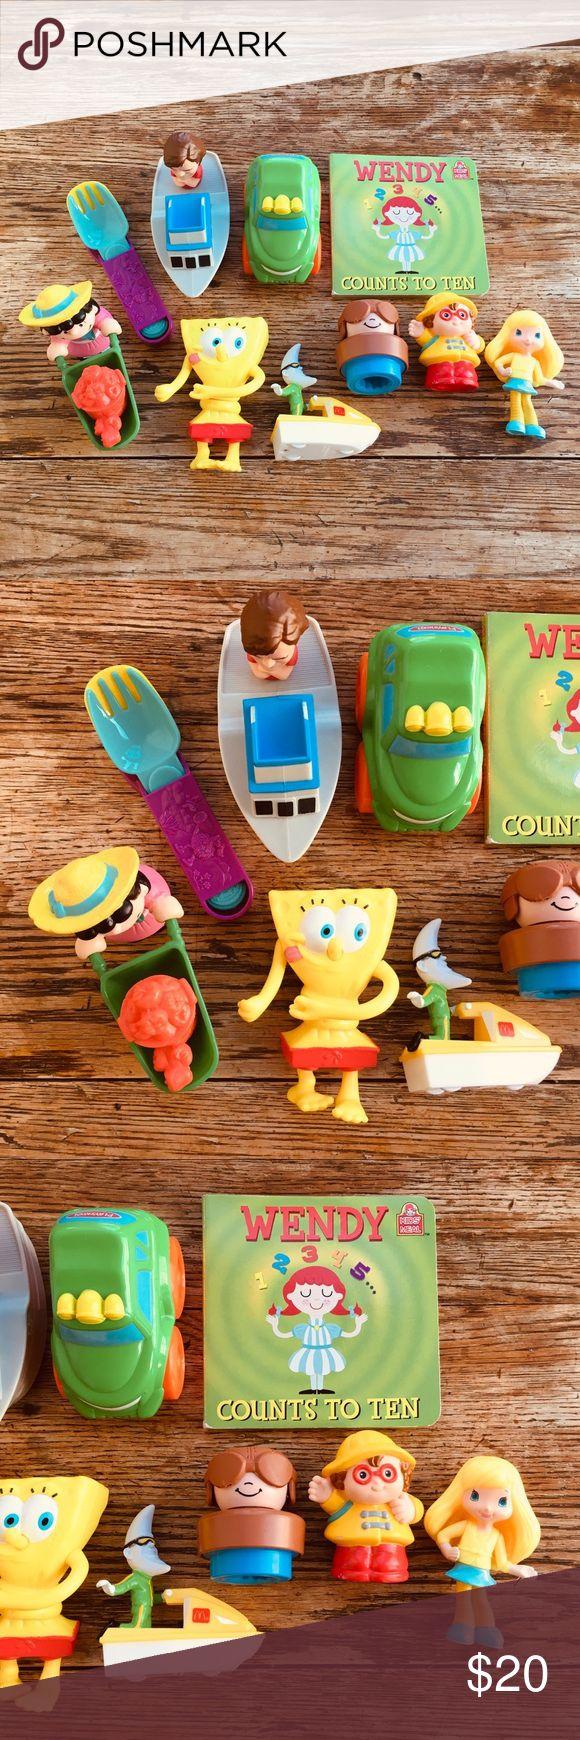 Vintage—McDonald's Wendy's Burger King Toys Lot Vintage